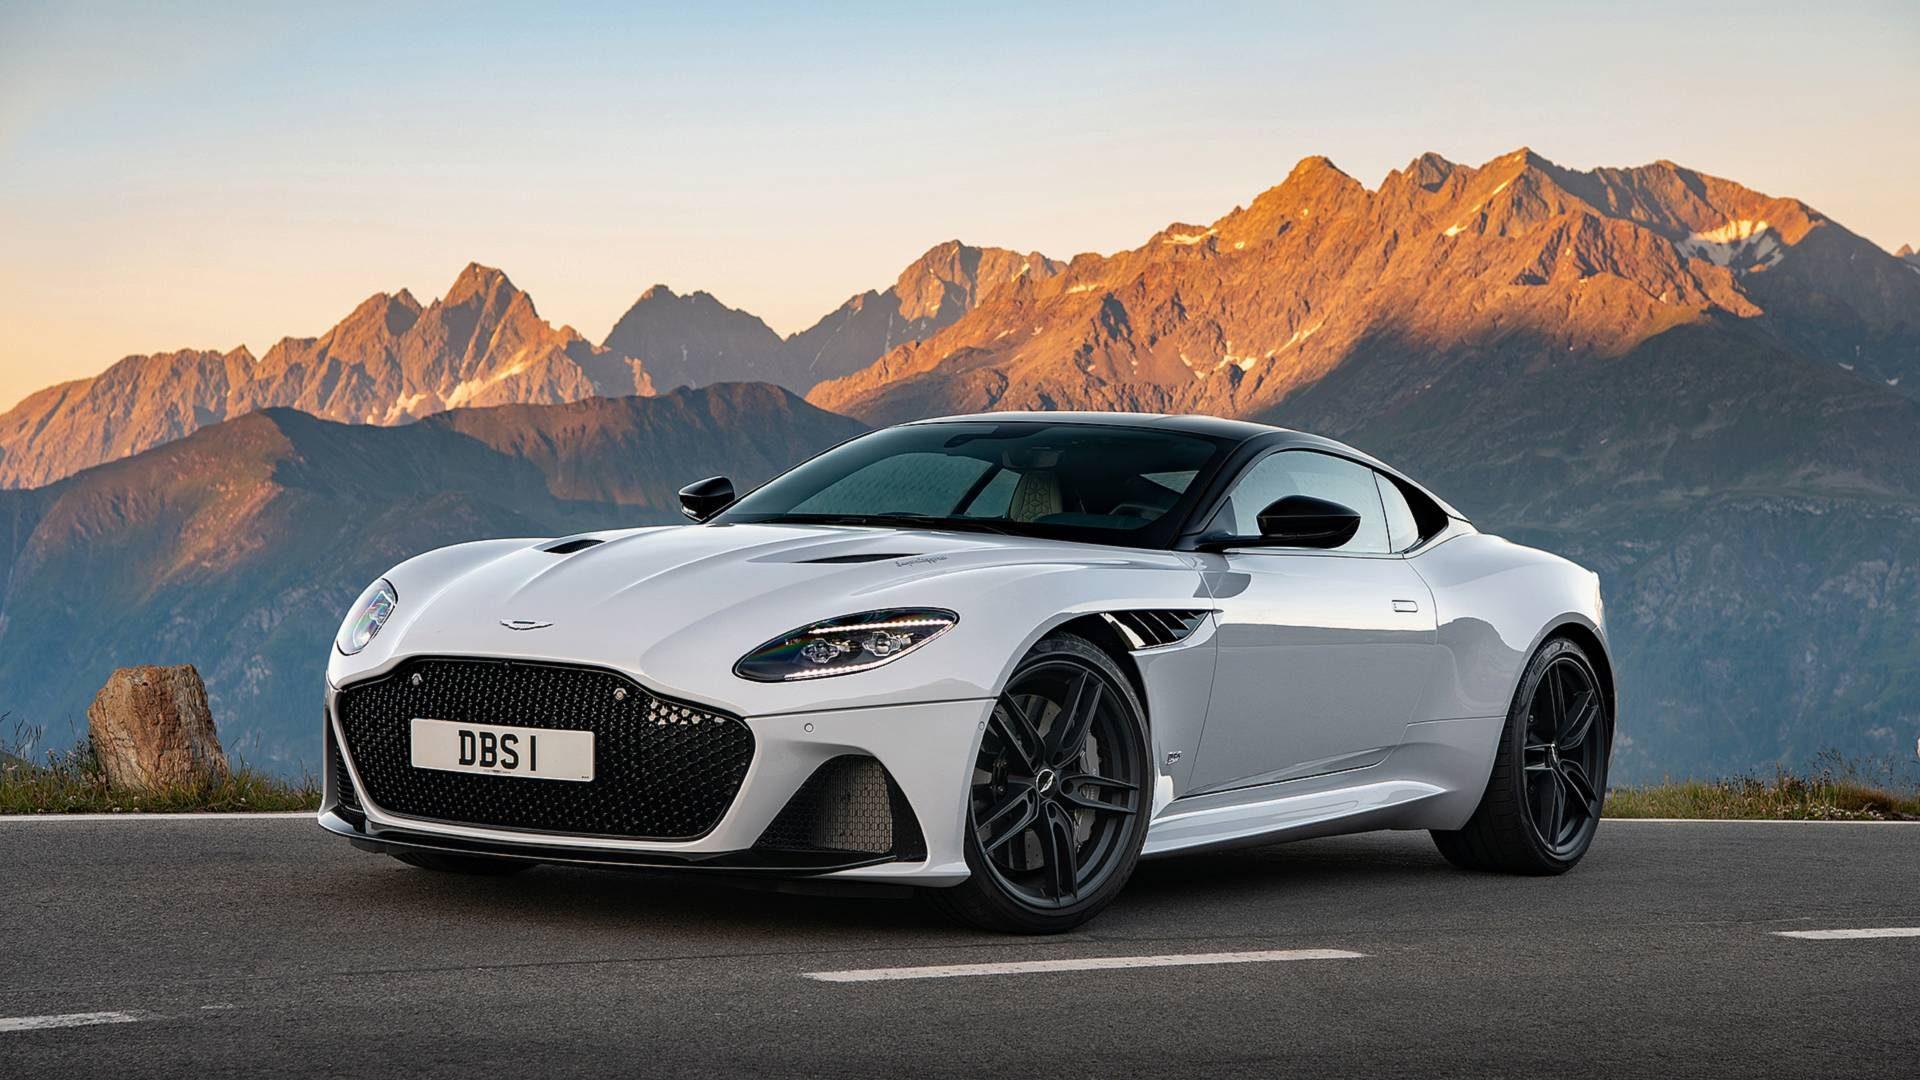 New Aston Martin >> Kiralik Aston Martin Fiyatlari Yolcu360 Com Haberler